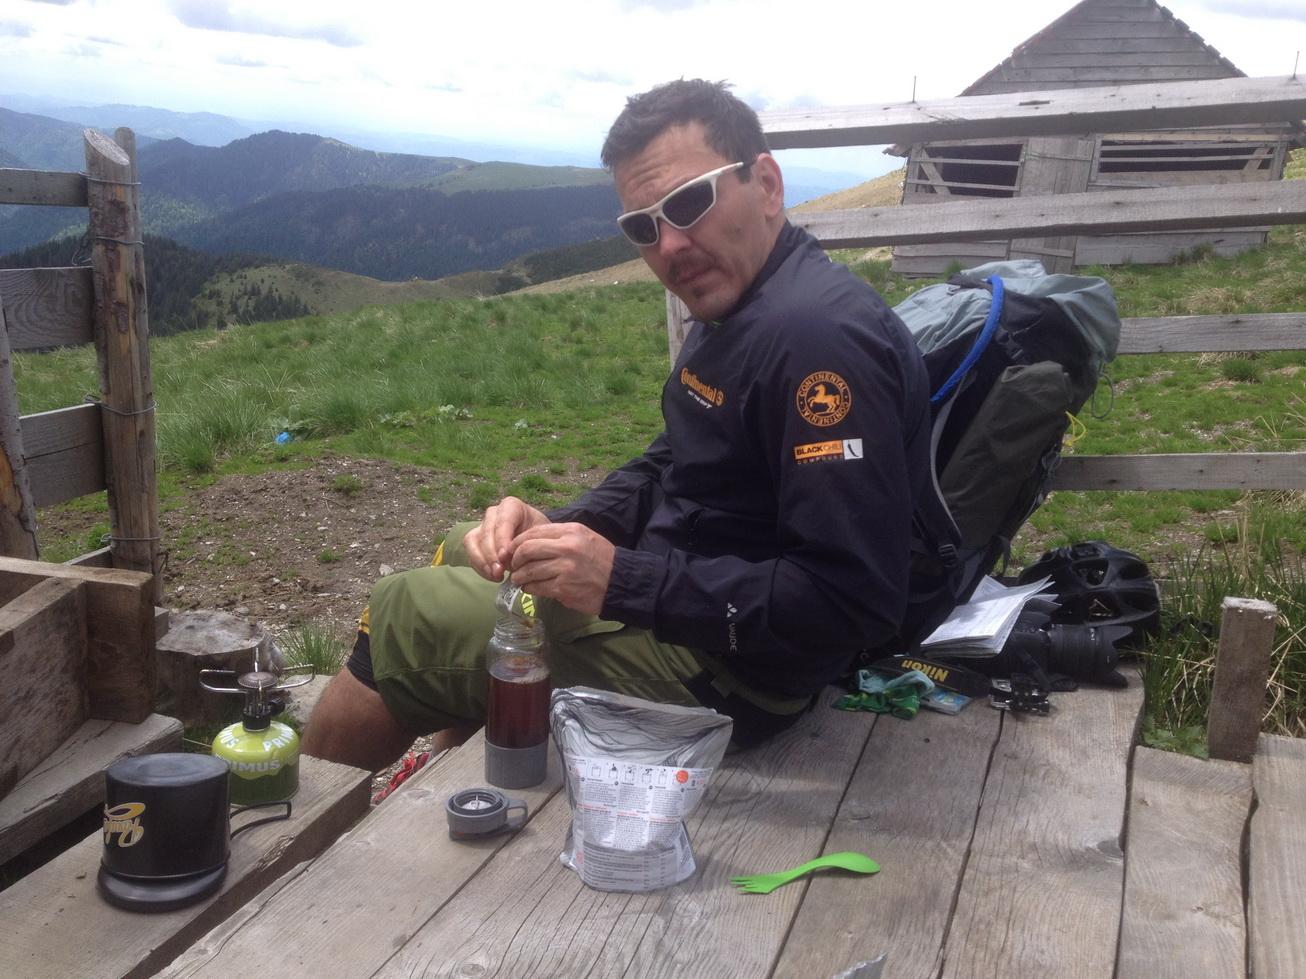 Bringás nomád akcióban Forrás: Paraferee - Mozgásvilág.hu